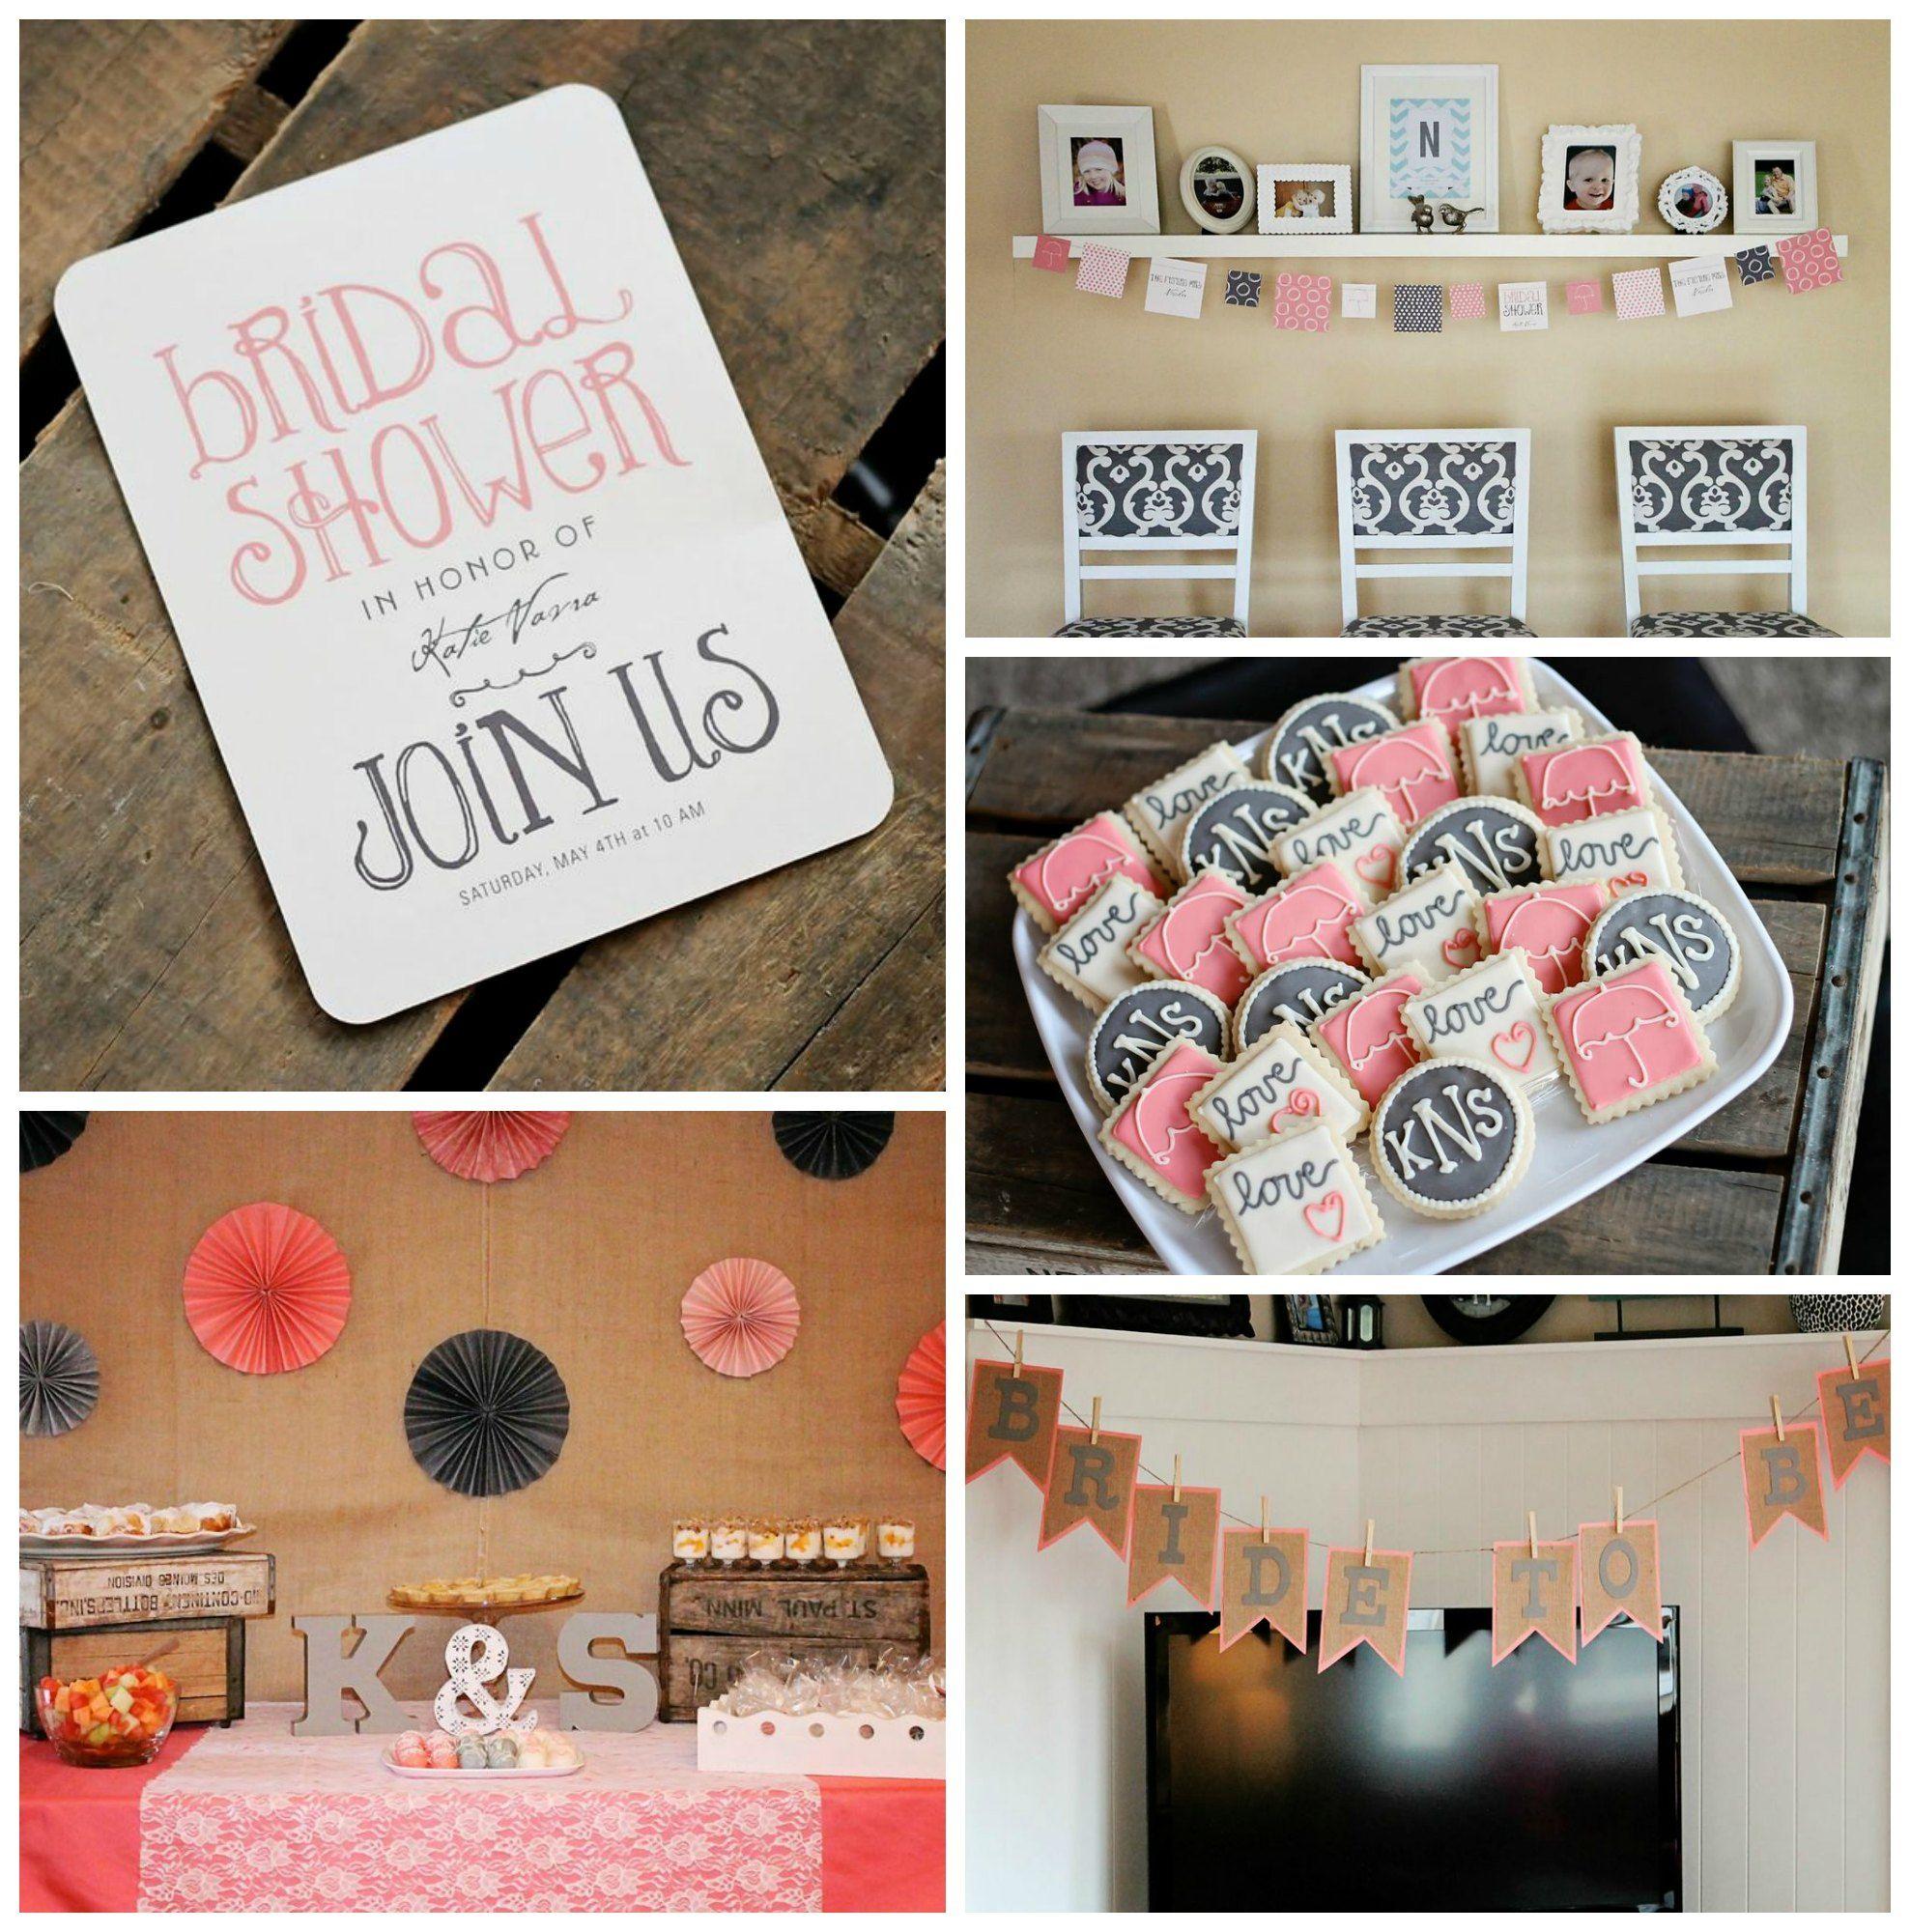 3 Bridal Shower Ideas Pear Tree Blog